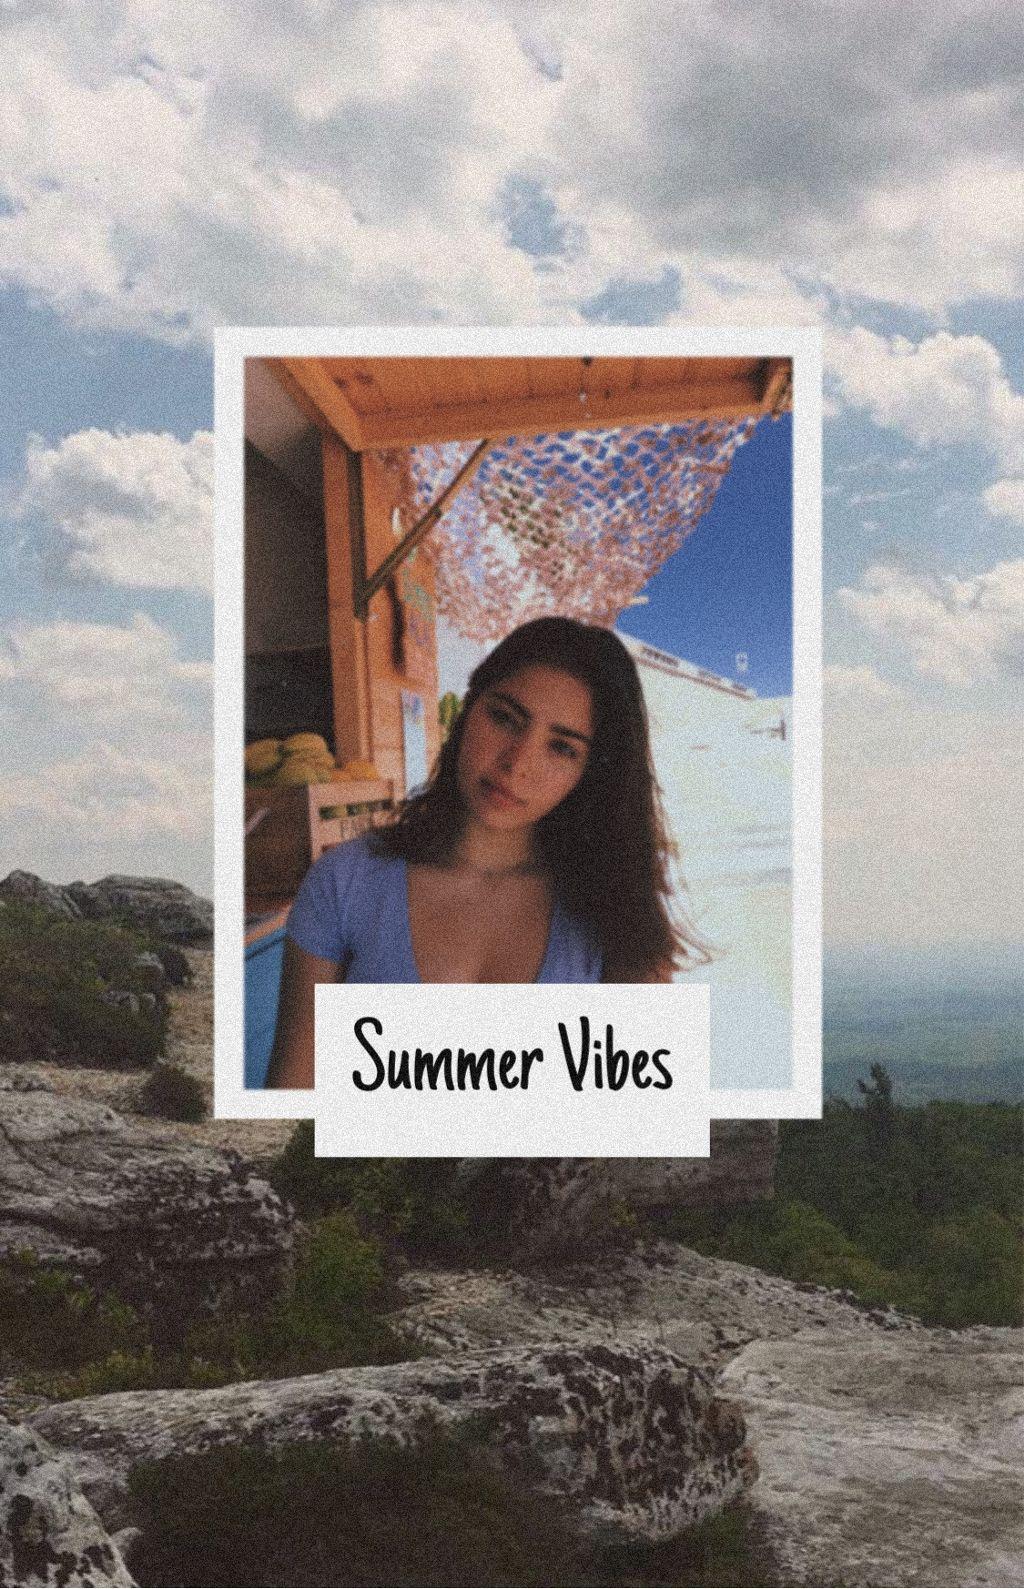 #freetoedit #replay #picsartreplay #summervibes